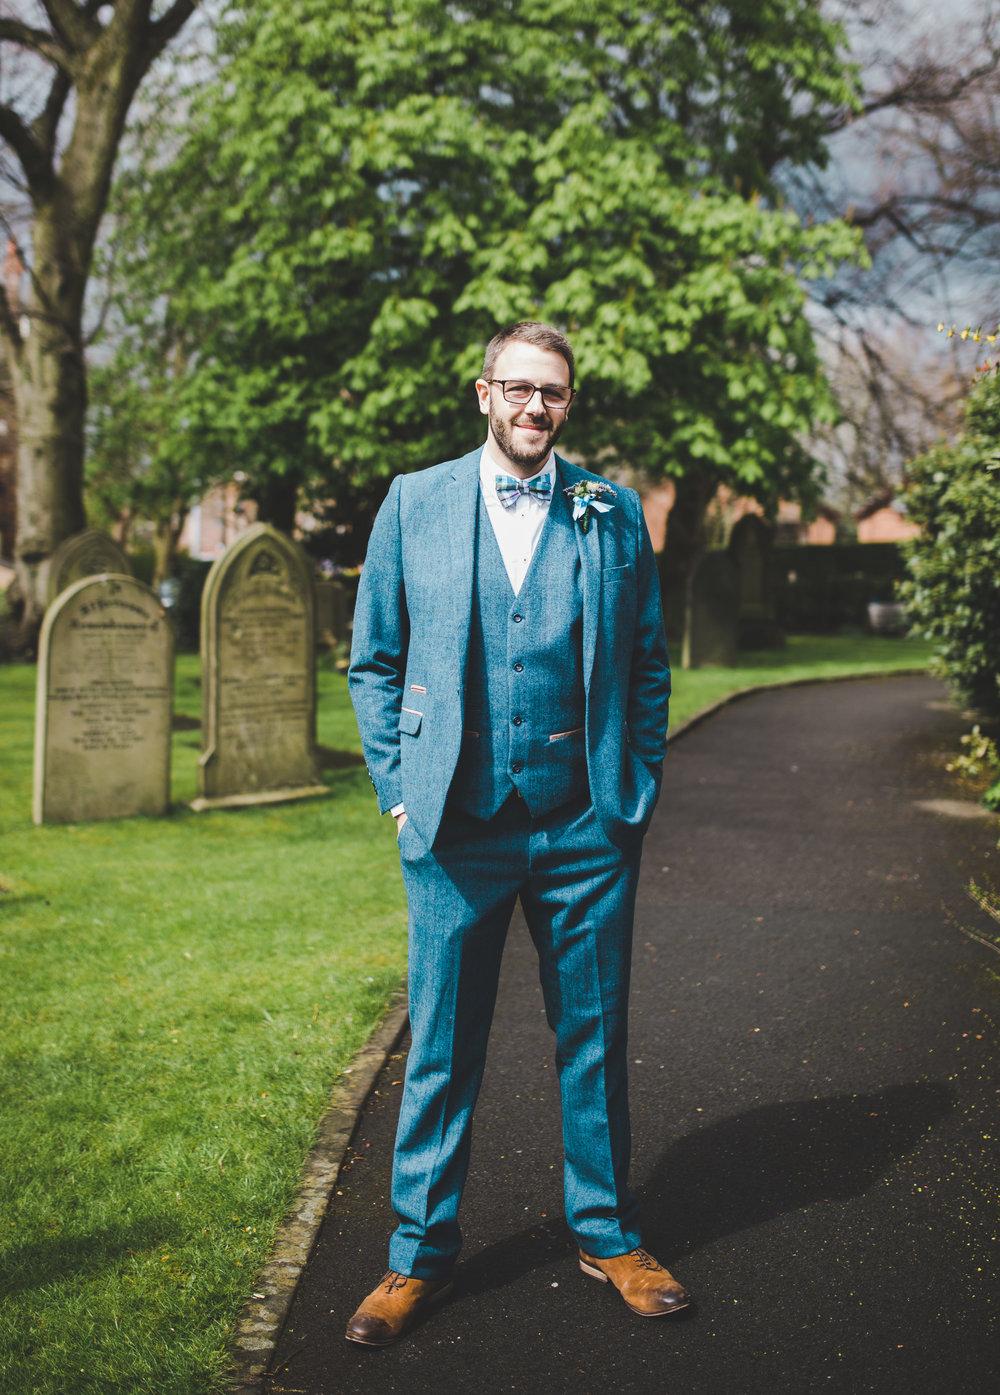 Cheshire wedding photographer - Marthall Hall Wedding (8).jpg